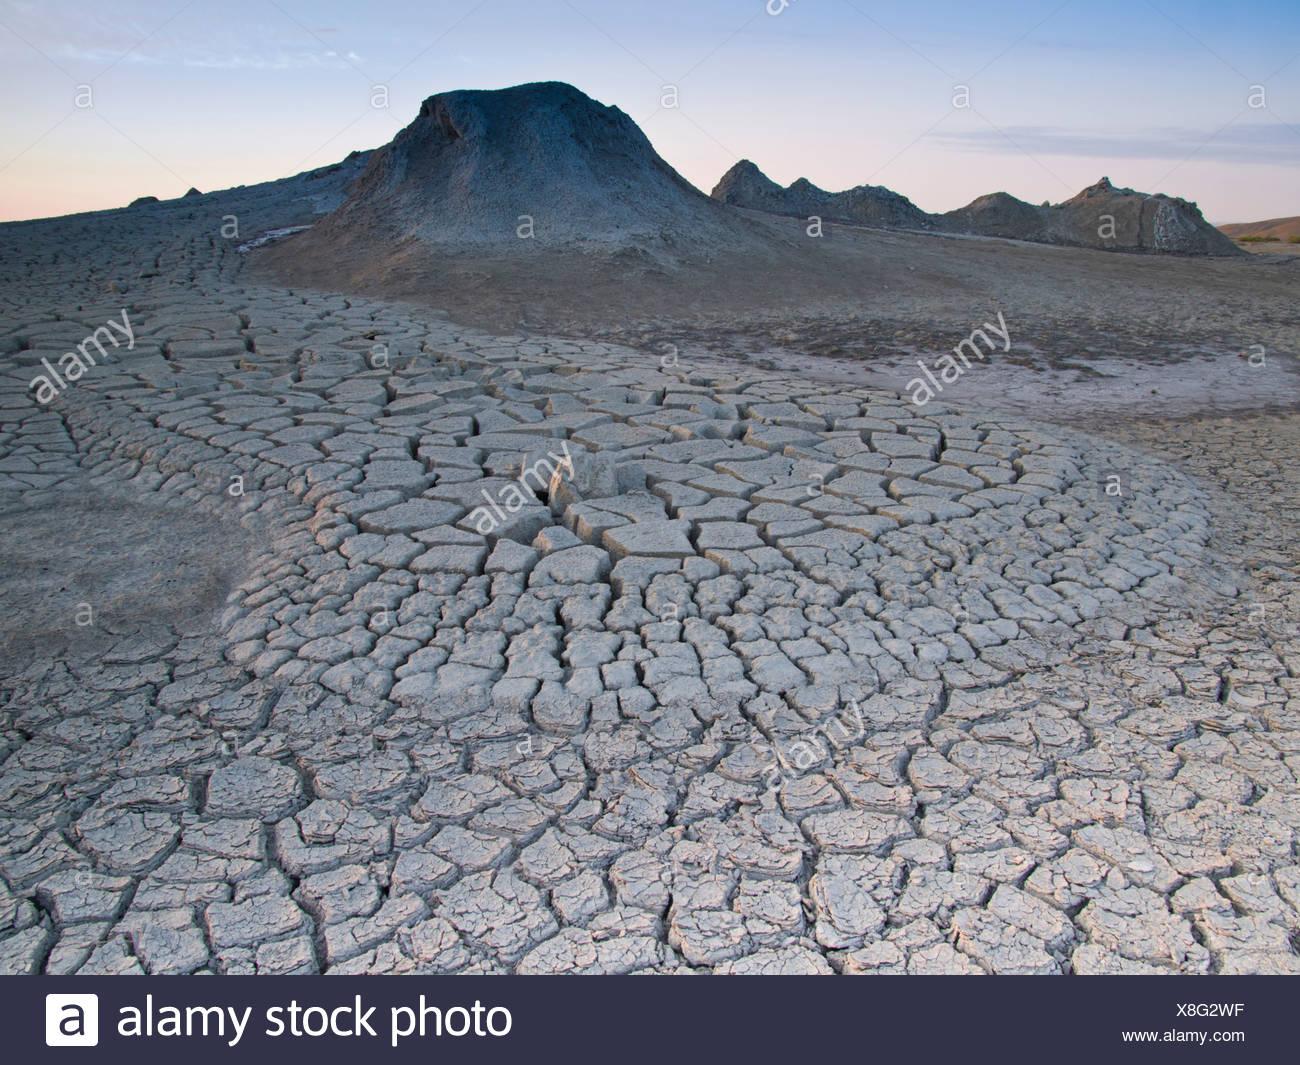 Azerbaijan, East, Asia, Caucasus, Quobustan, mud volcano, dry, Rissem, mud, slime, slushy, mud hole, mud holes, volcano, geology - Stock Image